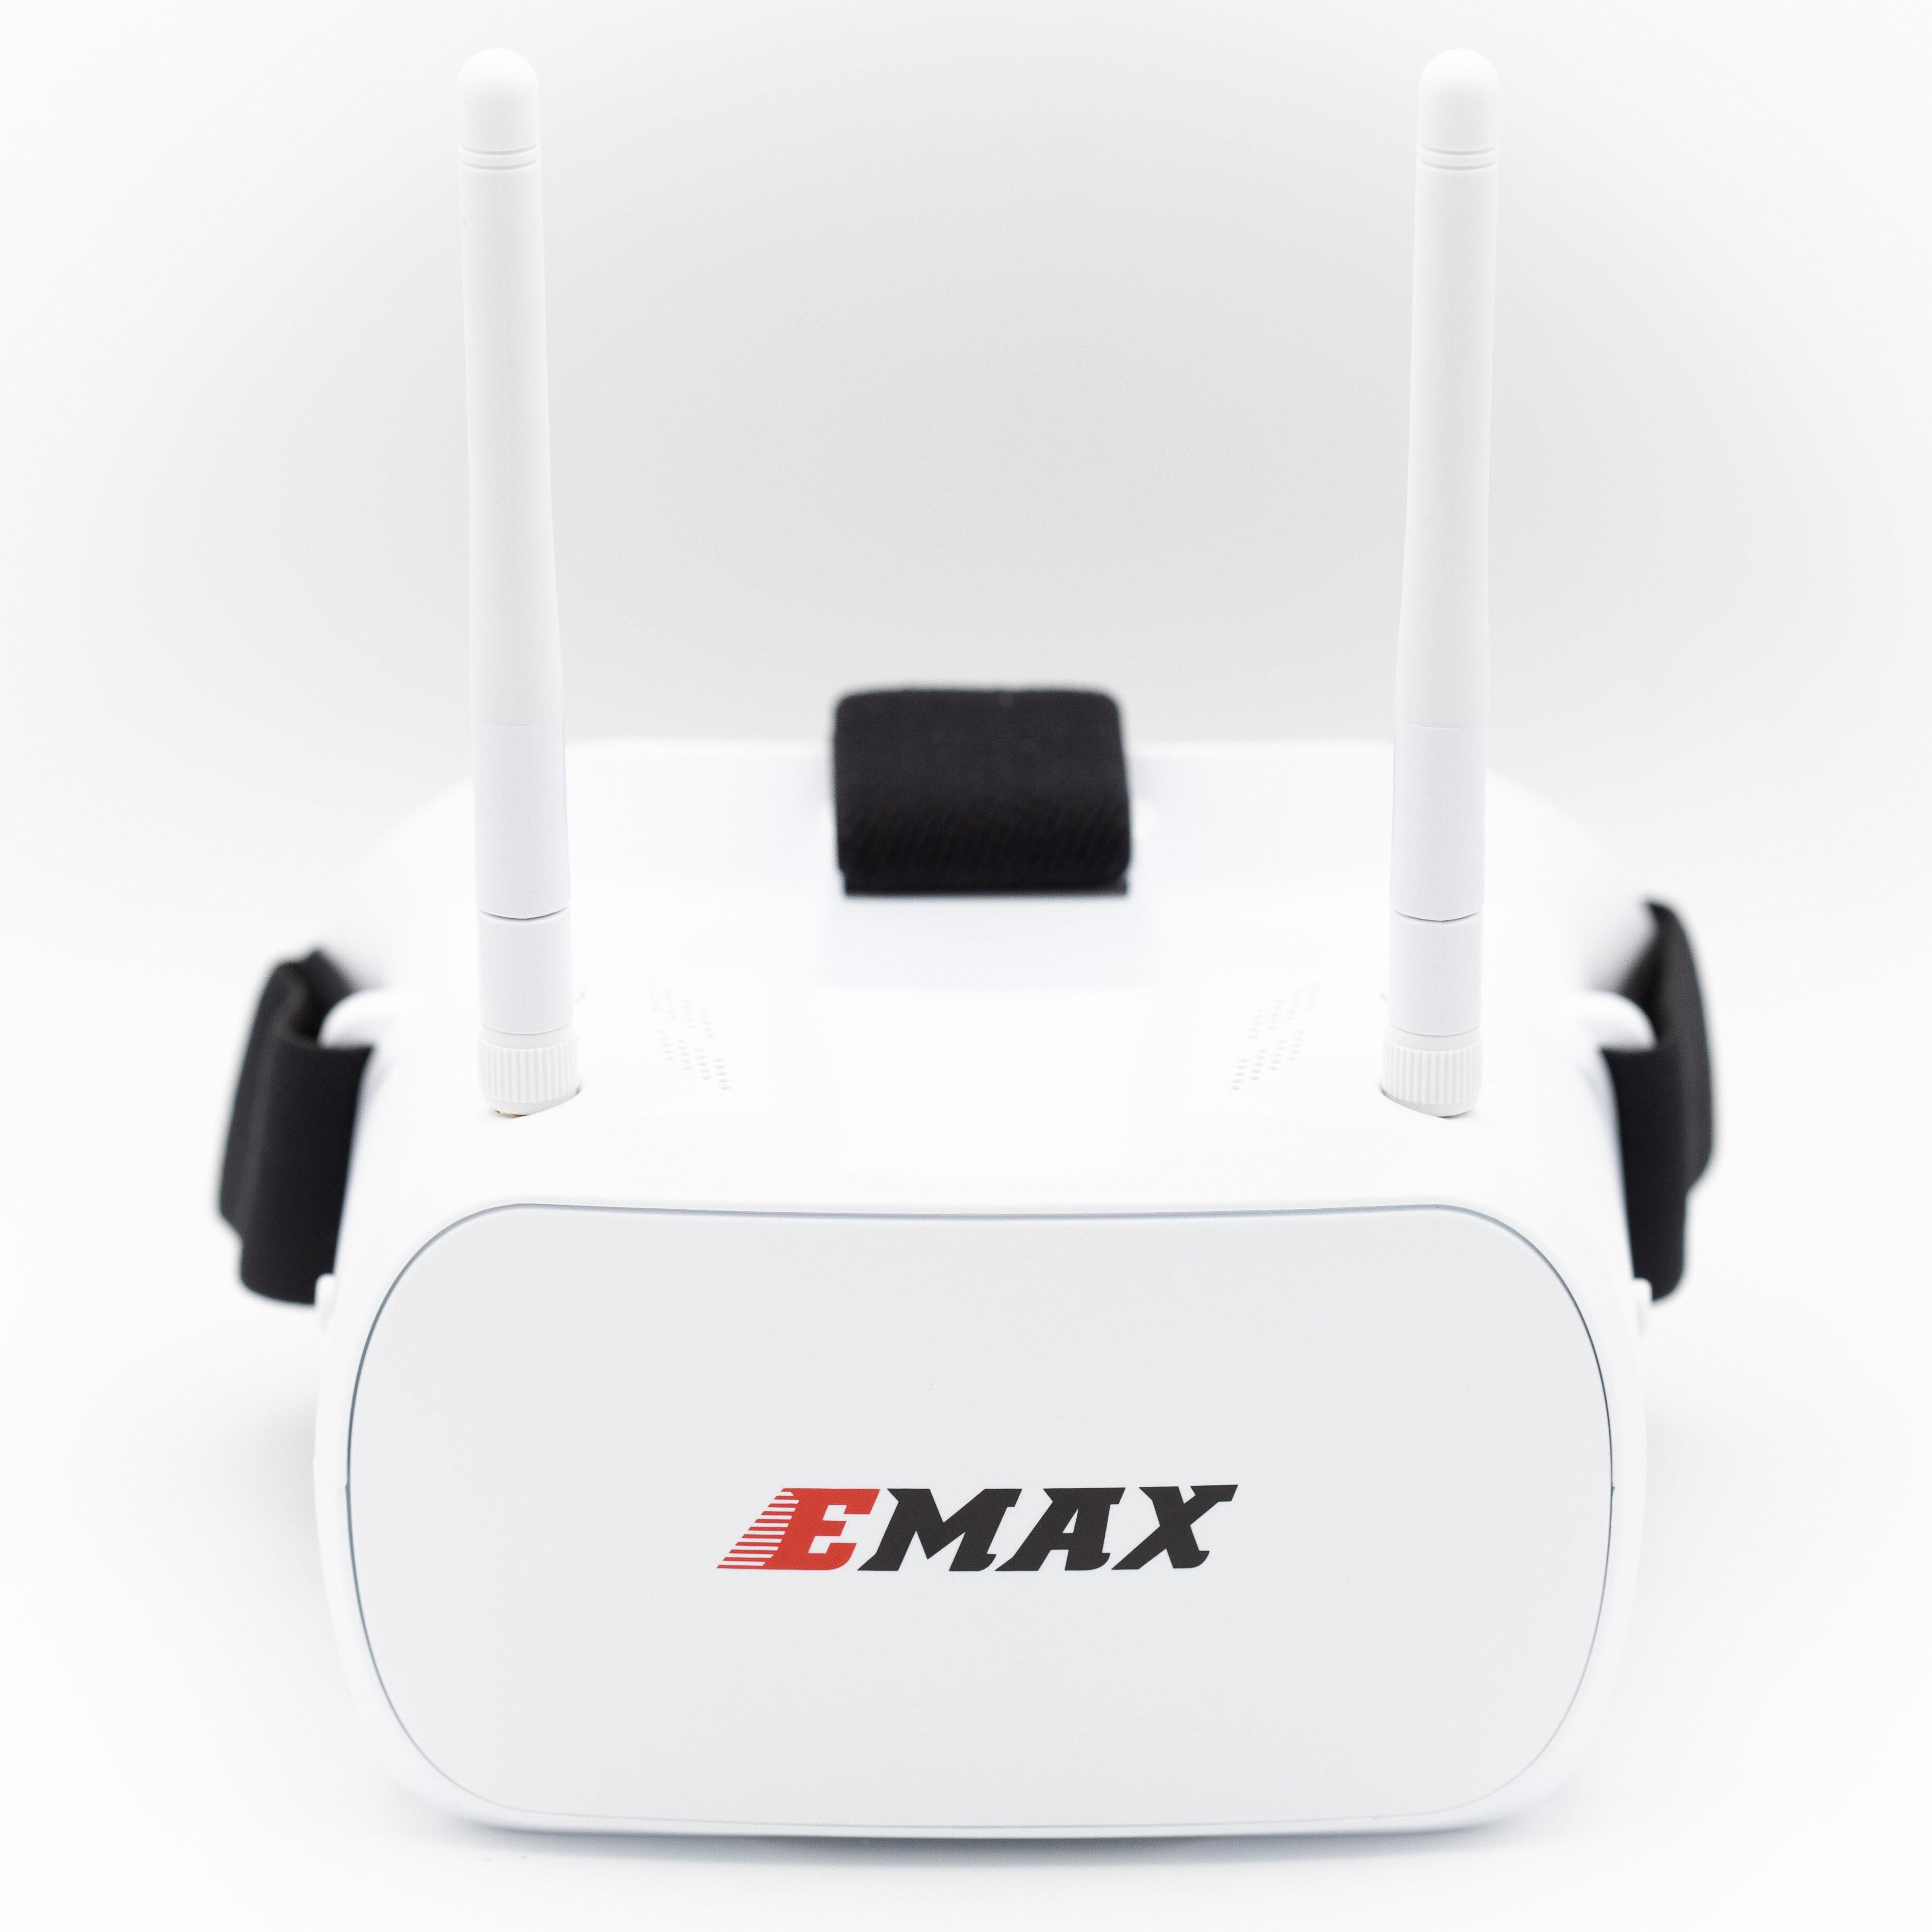 EMAX TinyhawkIIフリースタイル2.5インチ115mmホイールベースFPVレーシングドローンRTFFrsky D8 Runcam Nano2カメラ200mWVTX 5A ESC